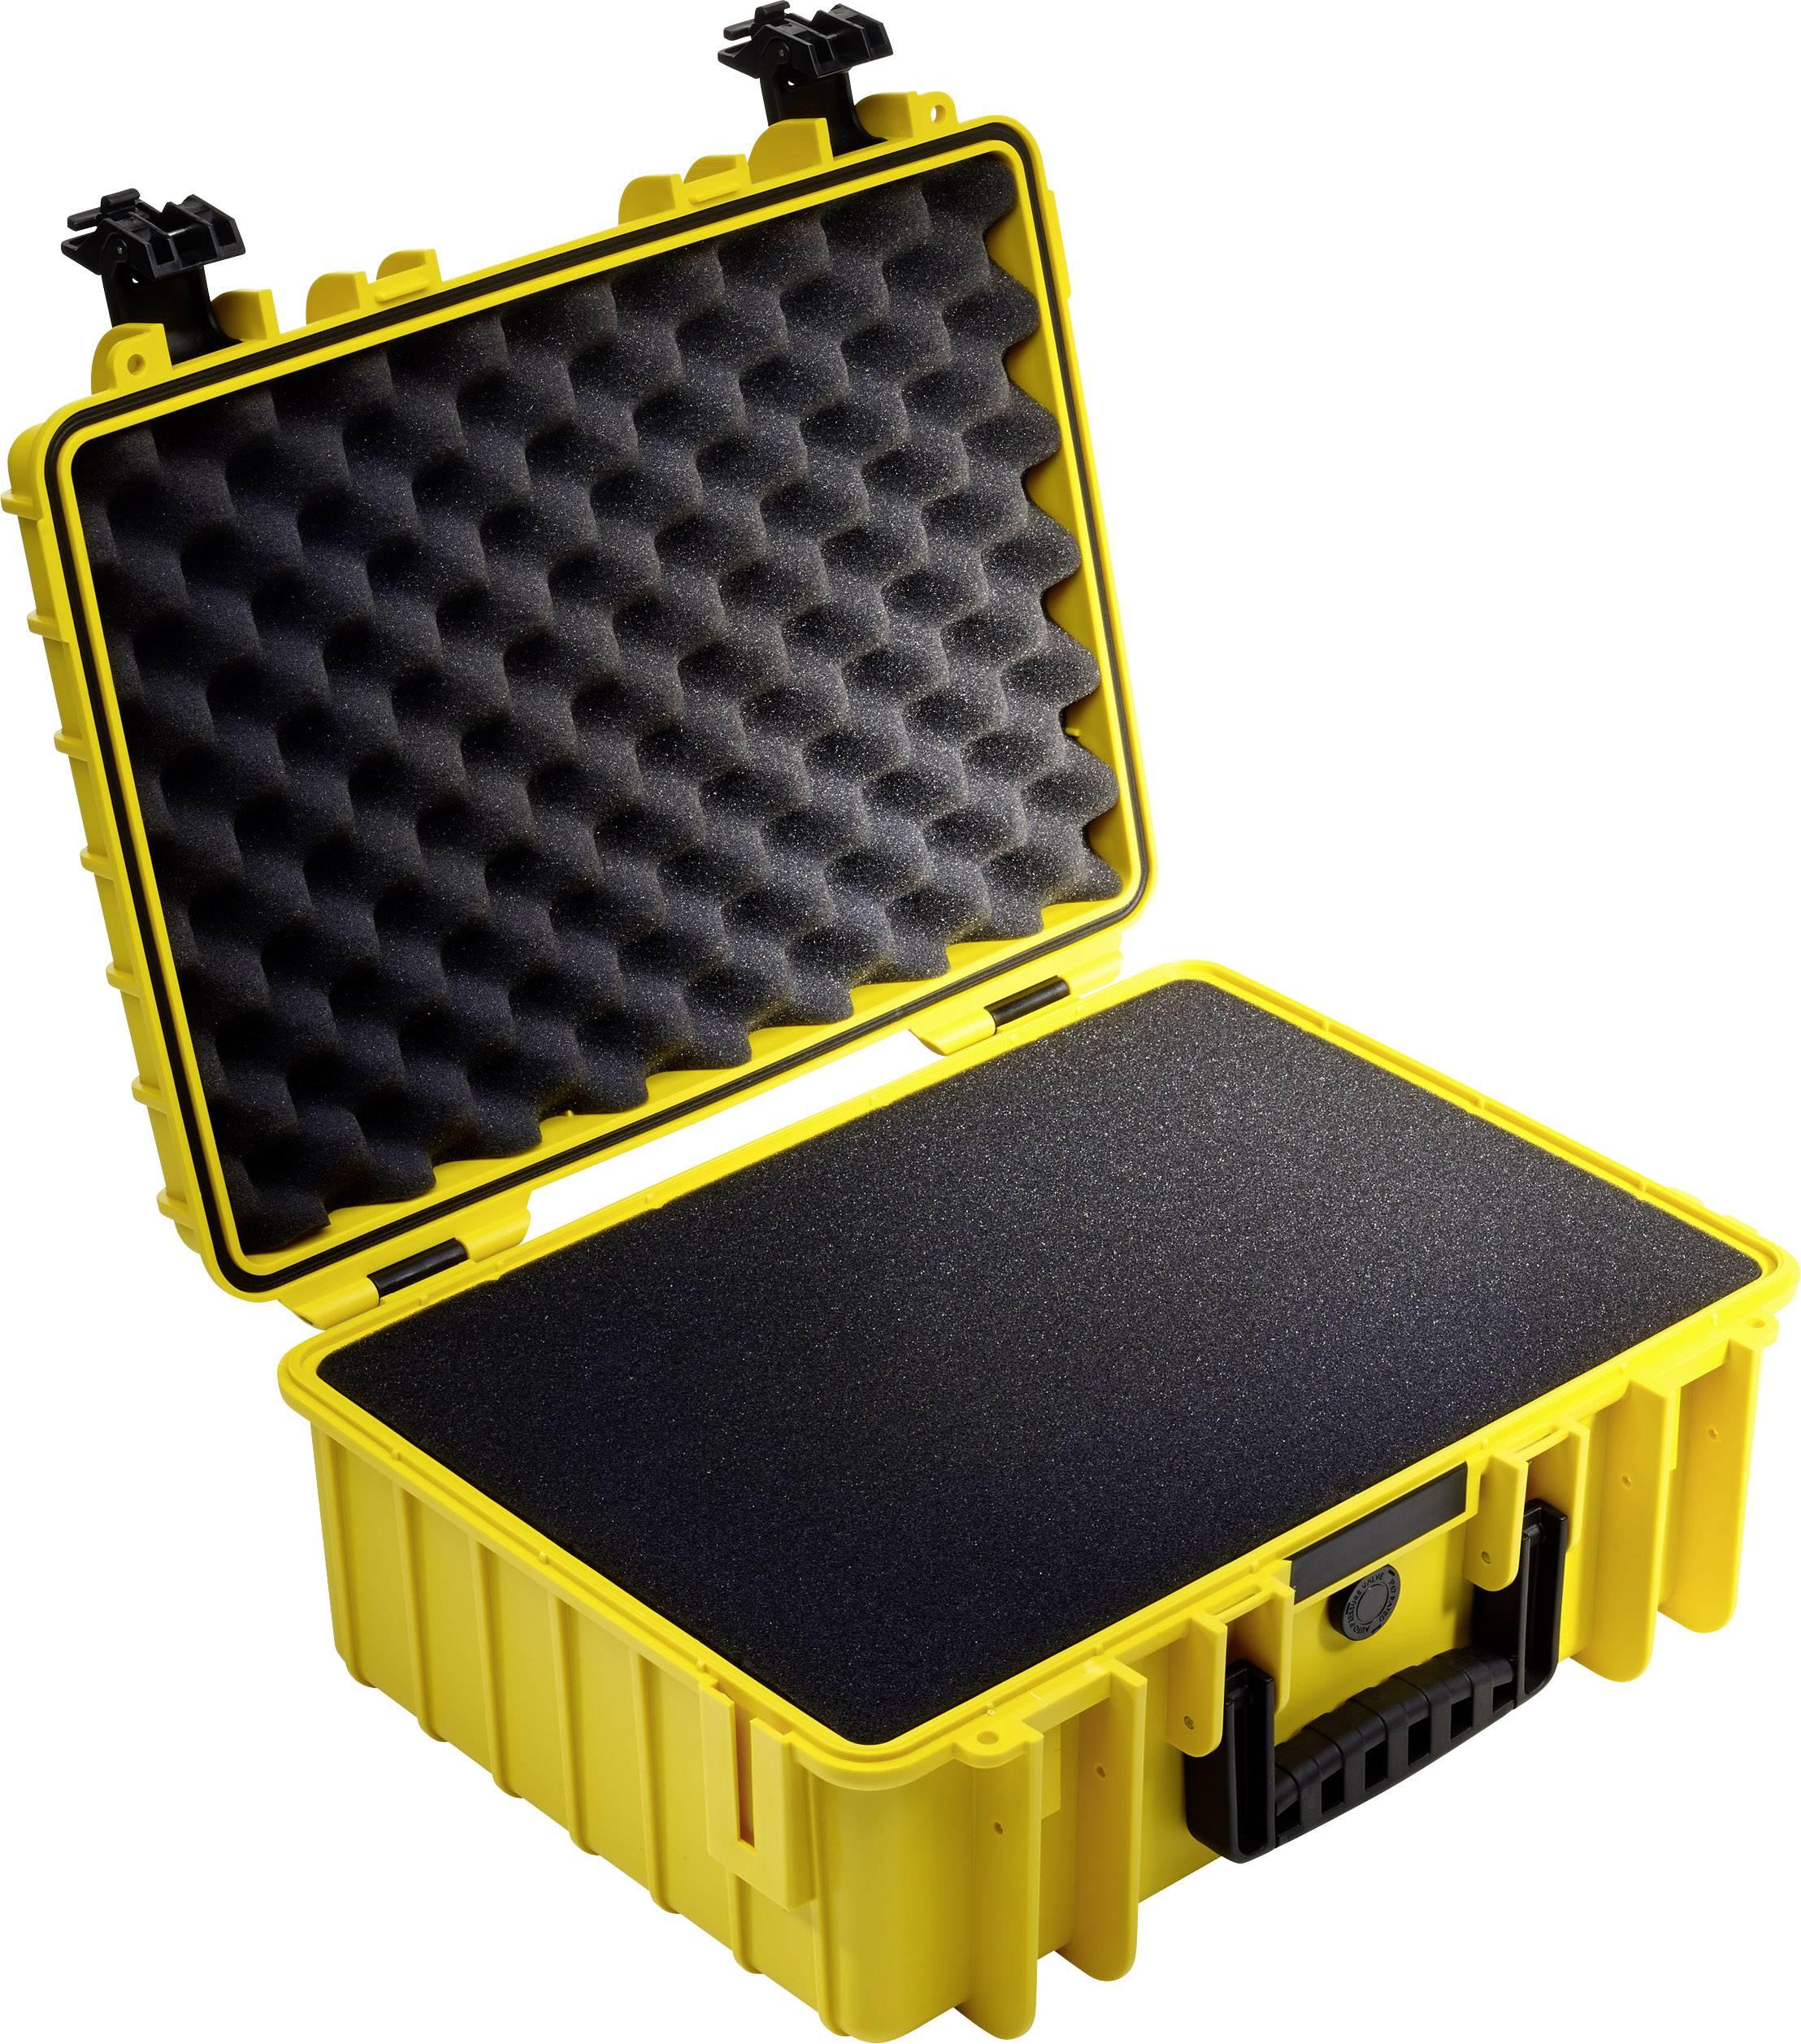 2c134c520d0 B & W Outdoor-koffer outdoor.cases Typ 5000 22.1 l (b x h x d) 469 x 188 x  365 mm Geel 5000/Y/SI